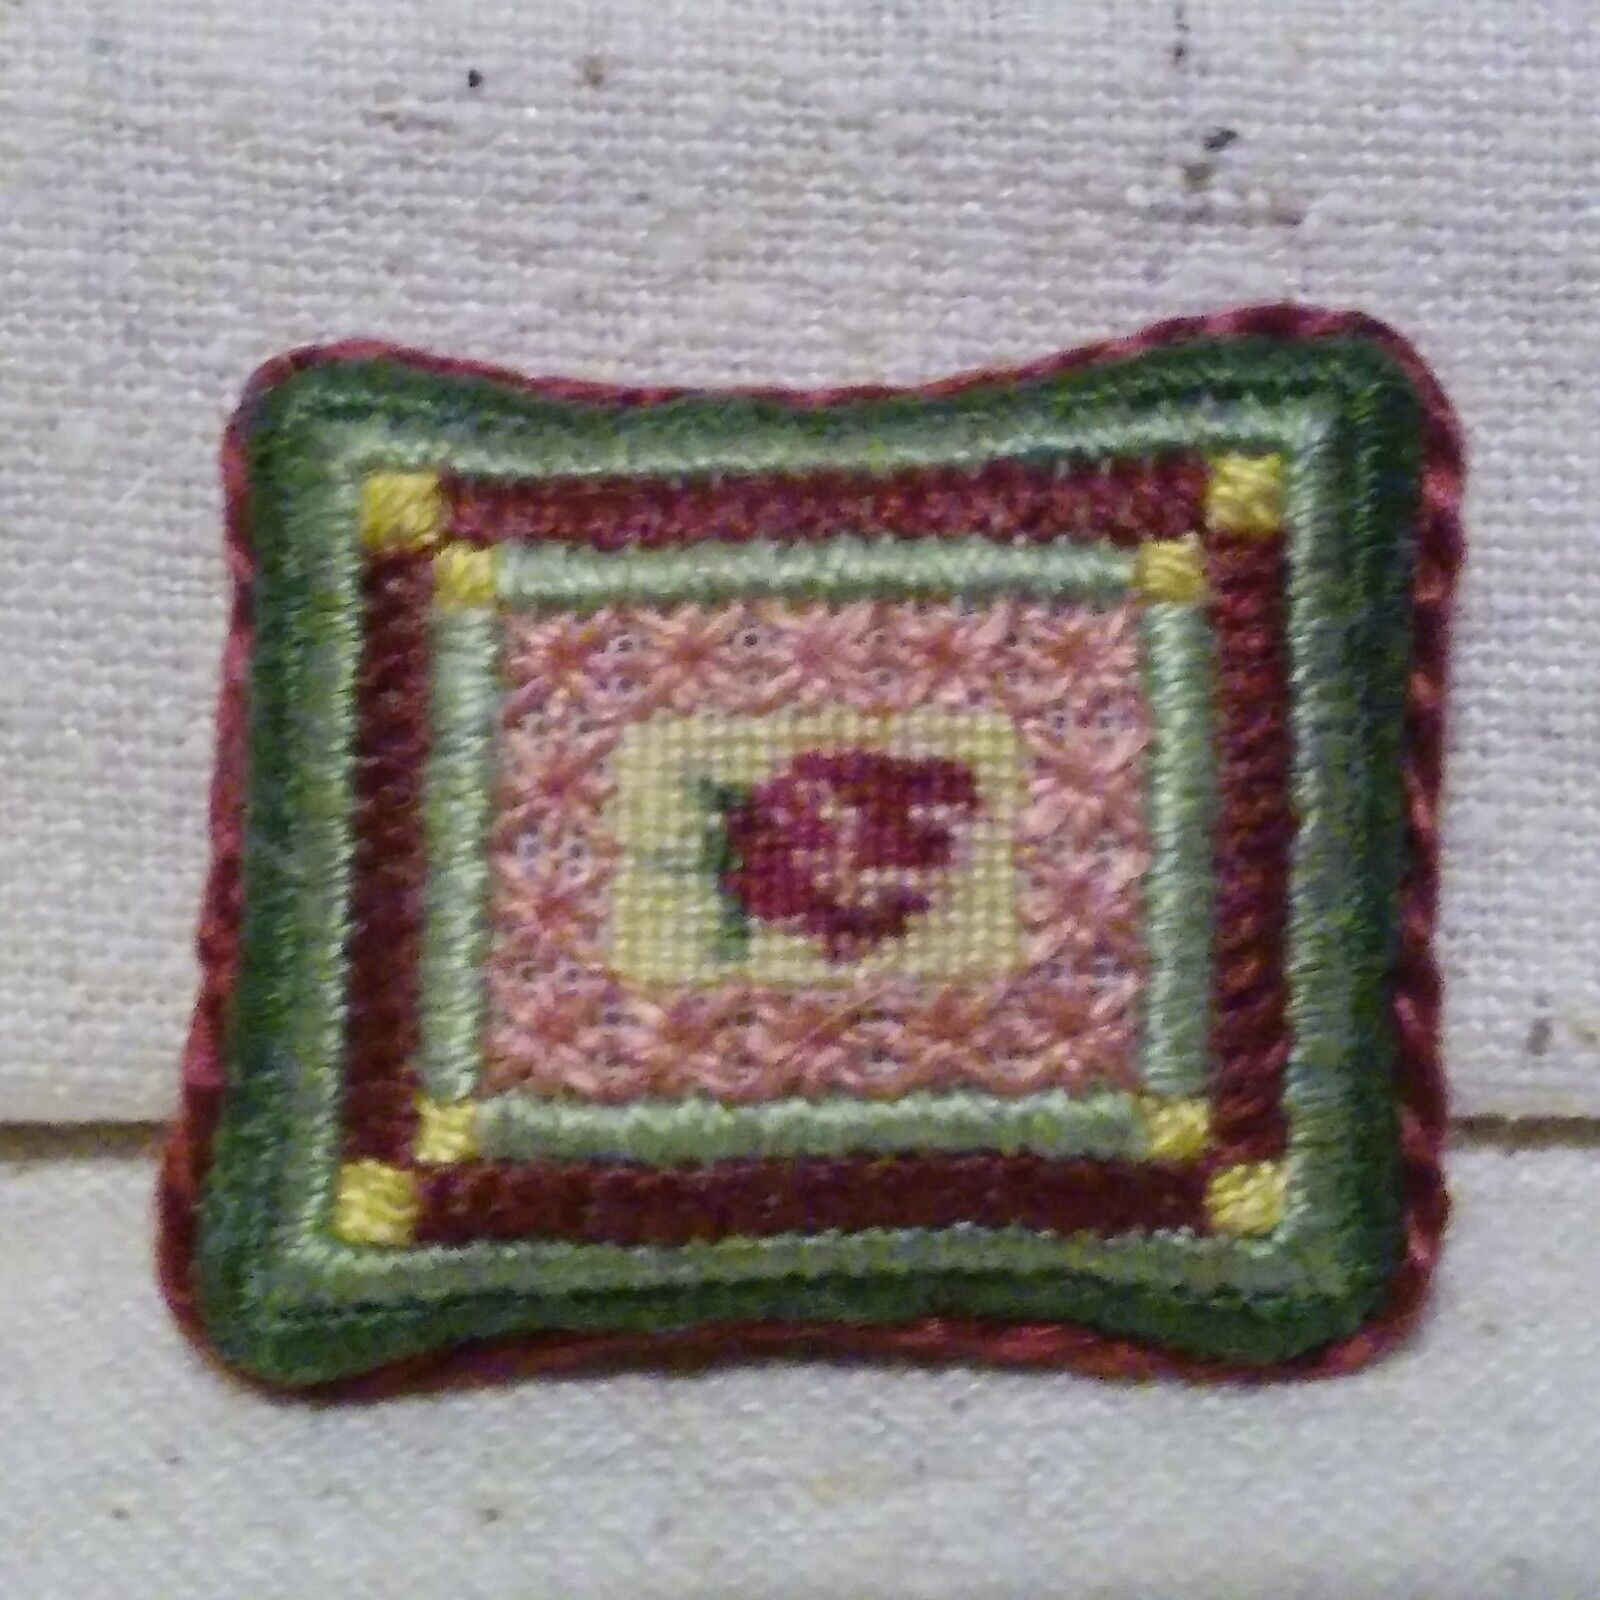 Miniature pillow petit point dollhouse 1:12